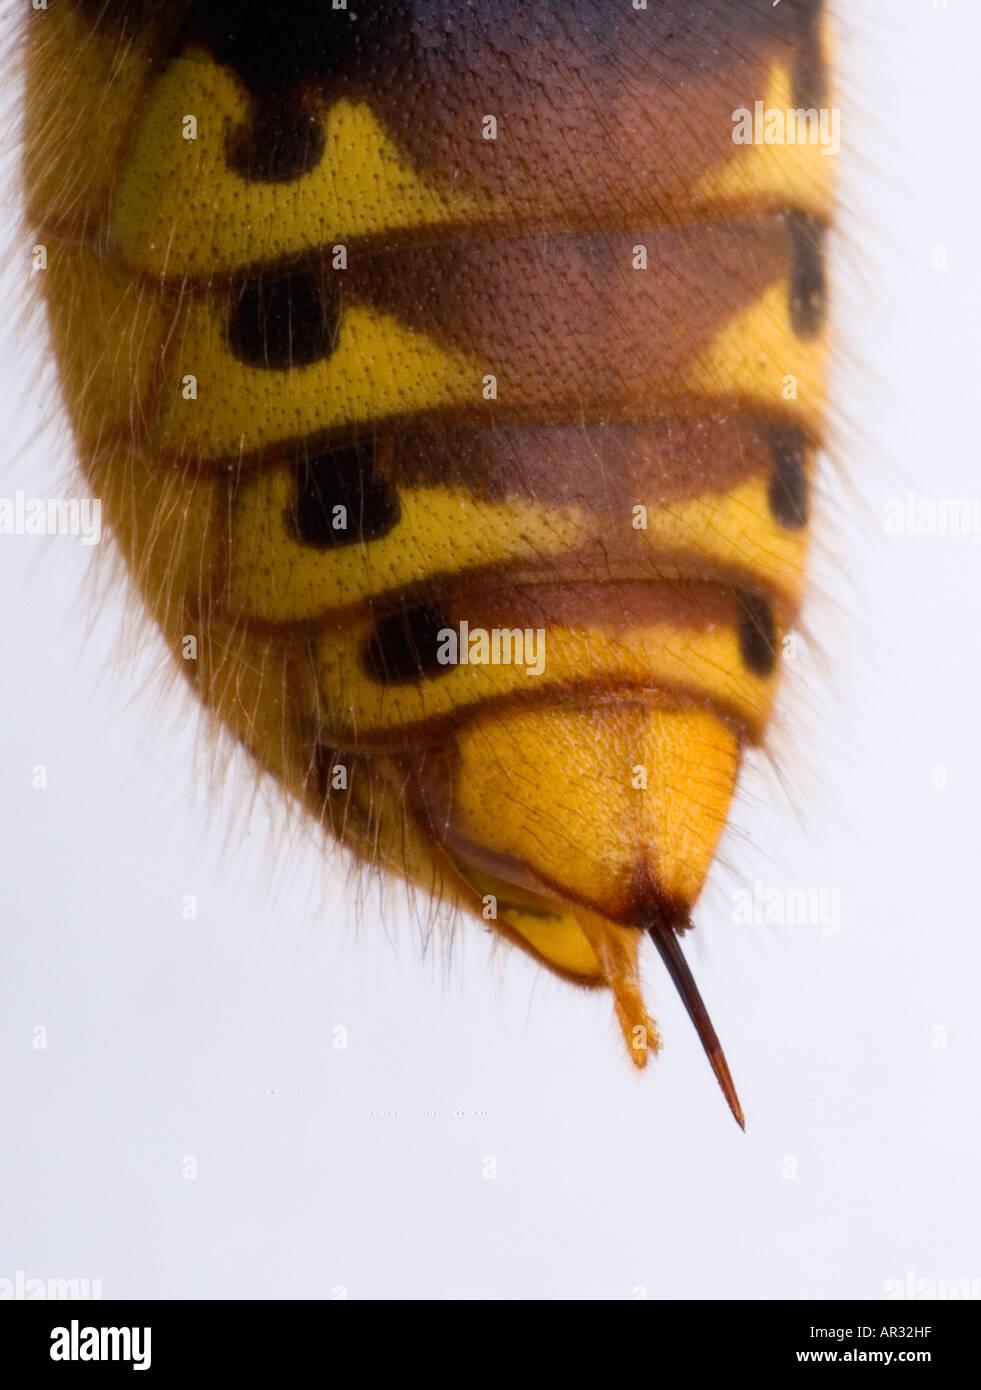 Hornet Vespa crabro Sting - Stock Image